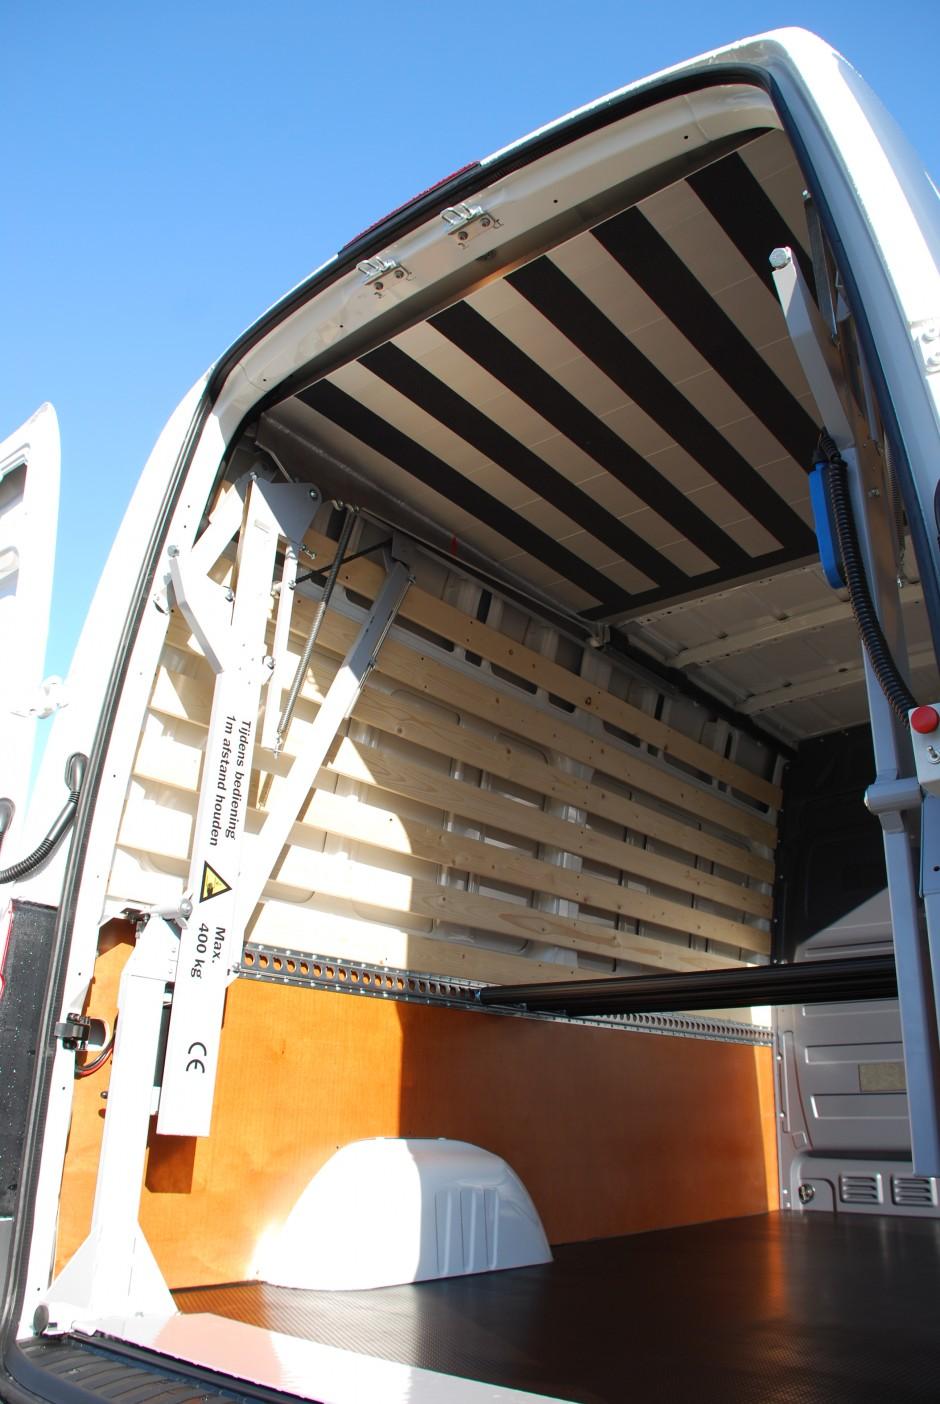 Easyloader in bedrijfswagen met lat om lat bekleding